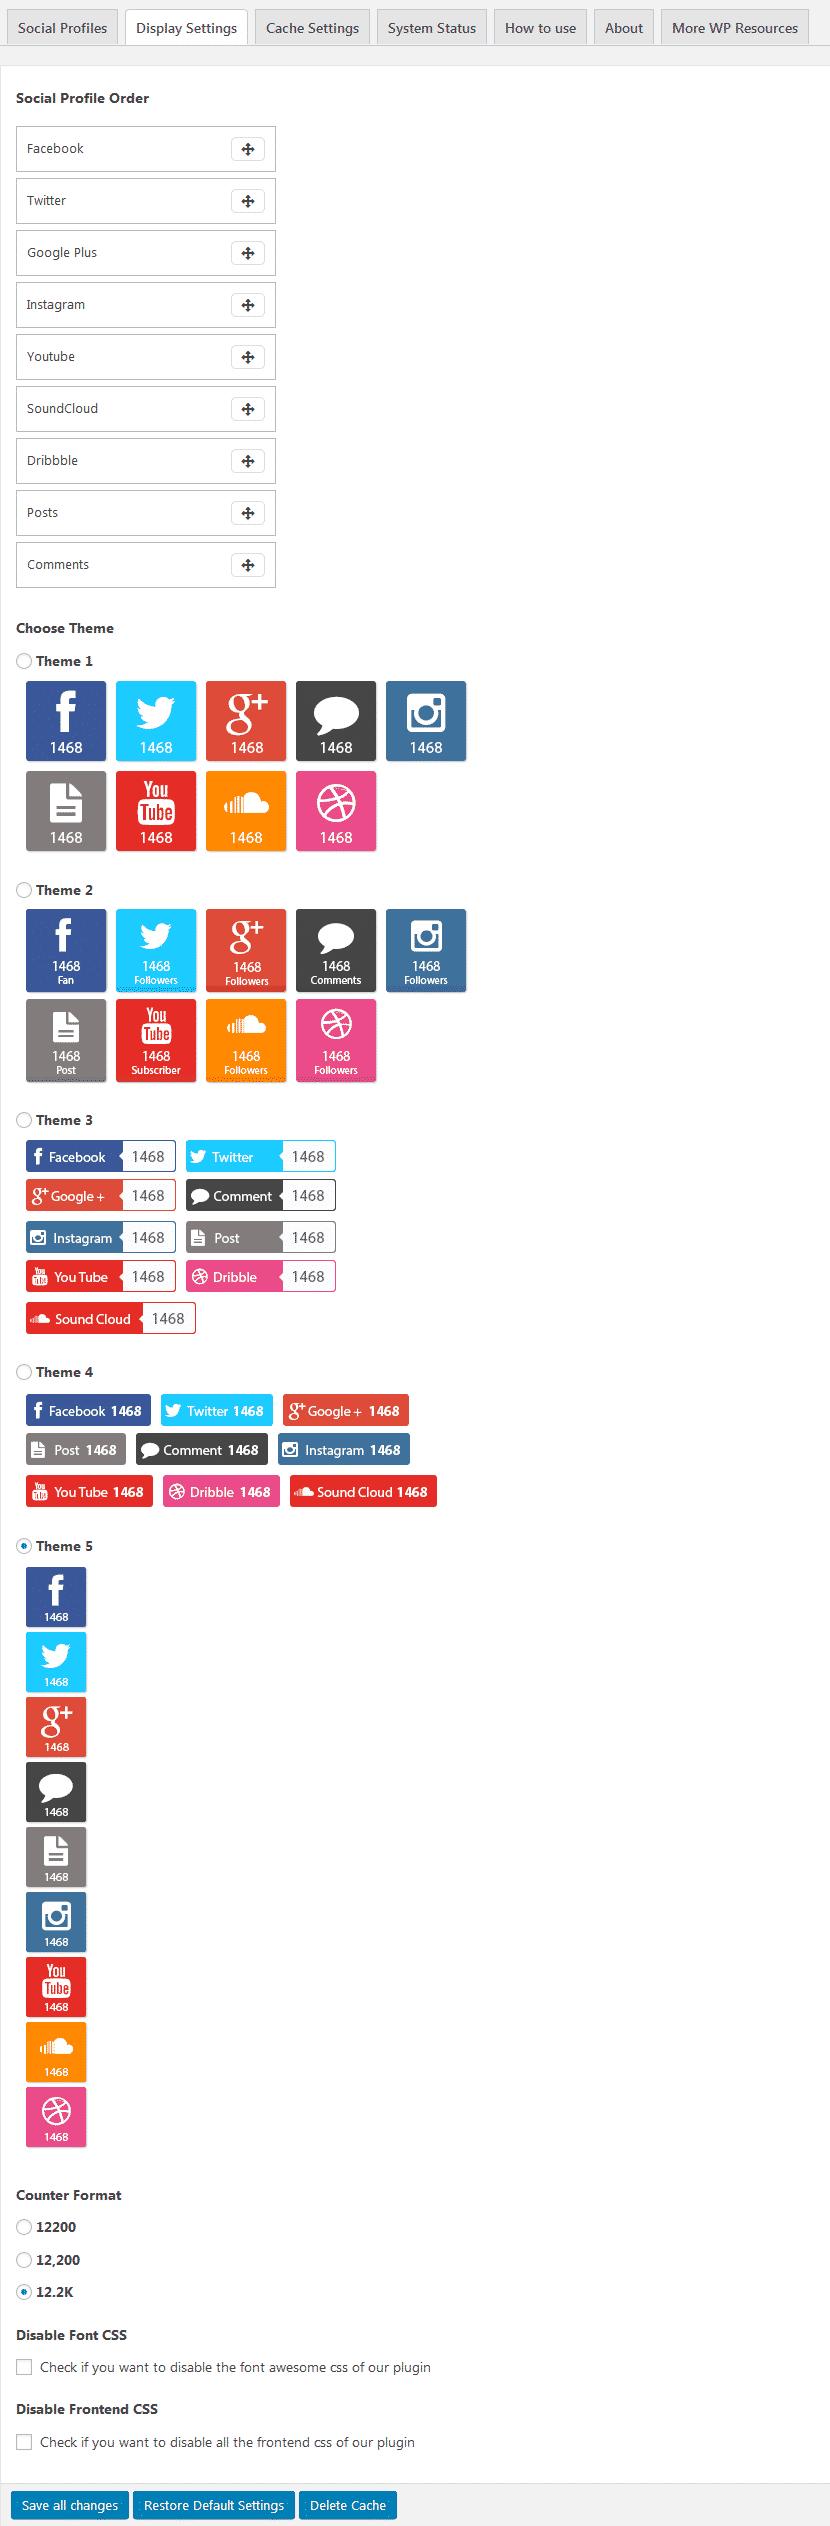 AccessPress Social Counter: Display Settings